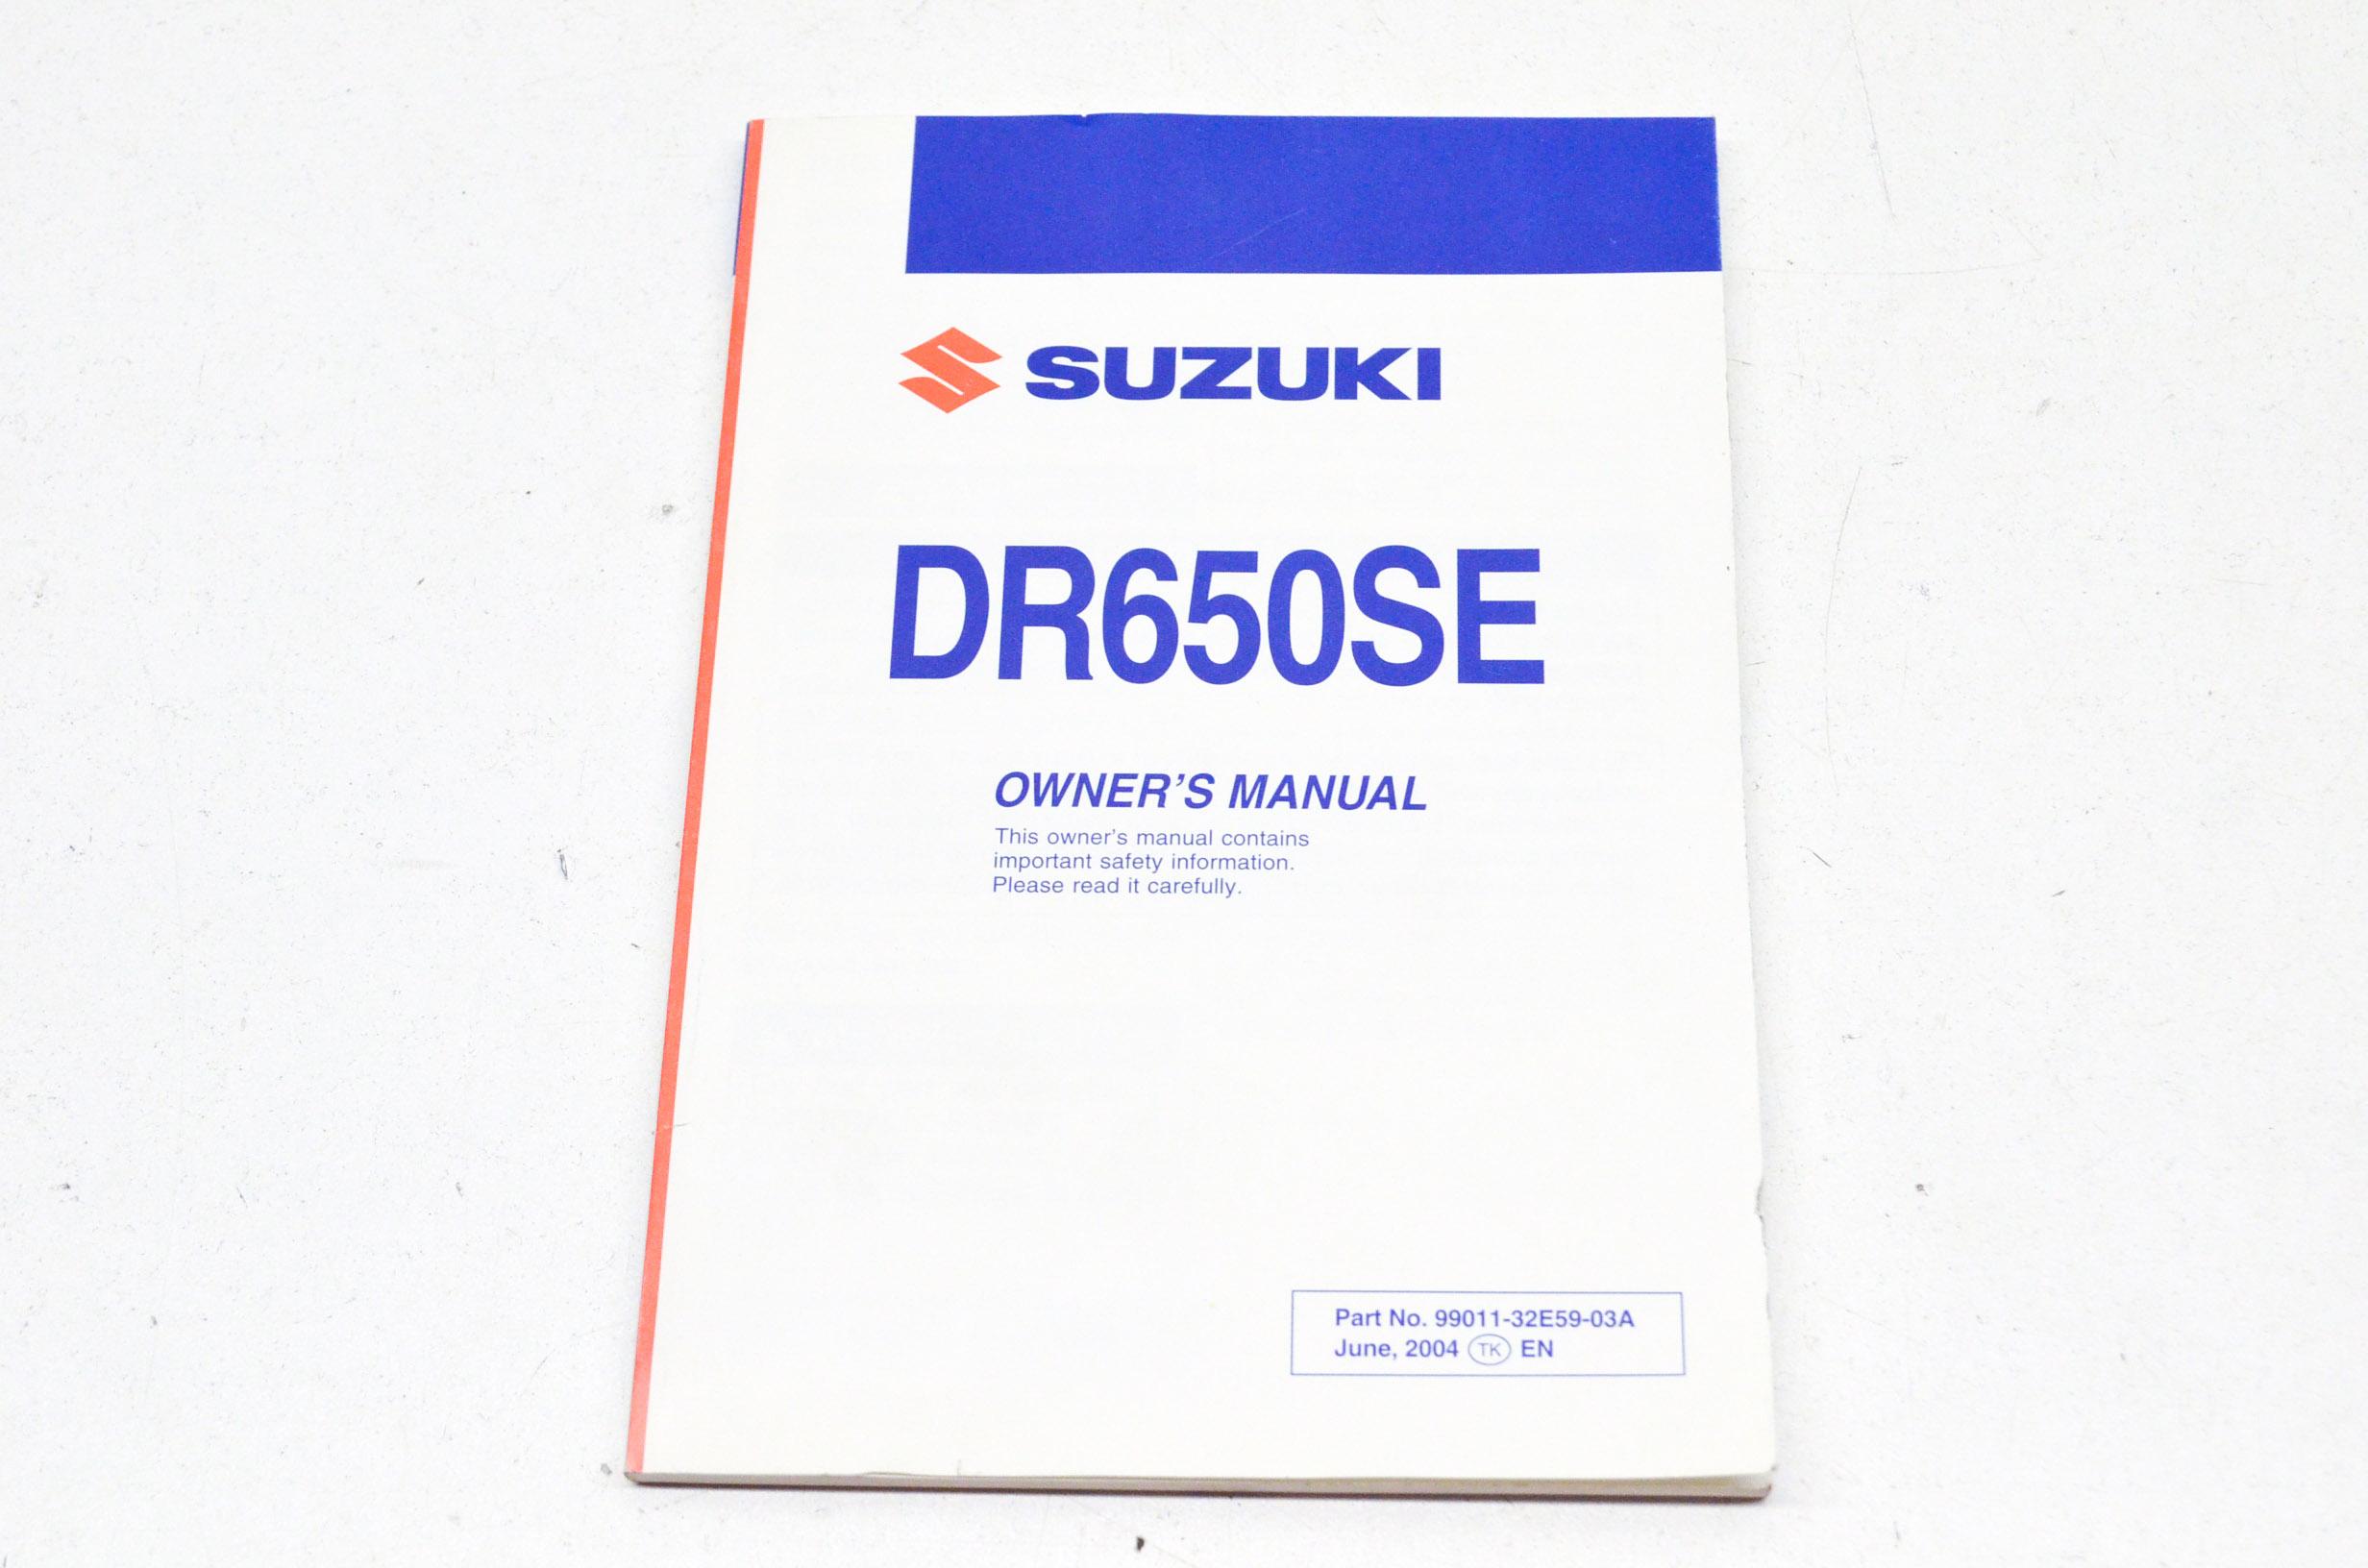 Details about New OEM Suzuki Owner's Manual DR650SE NOS